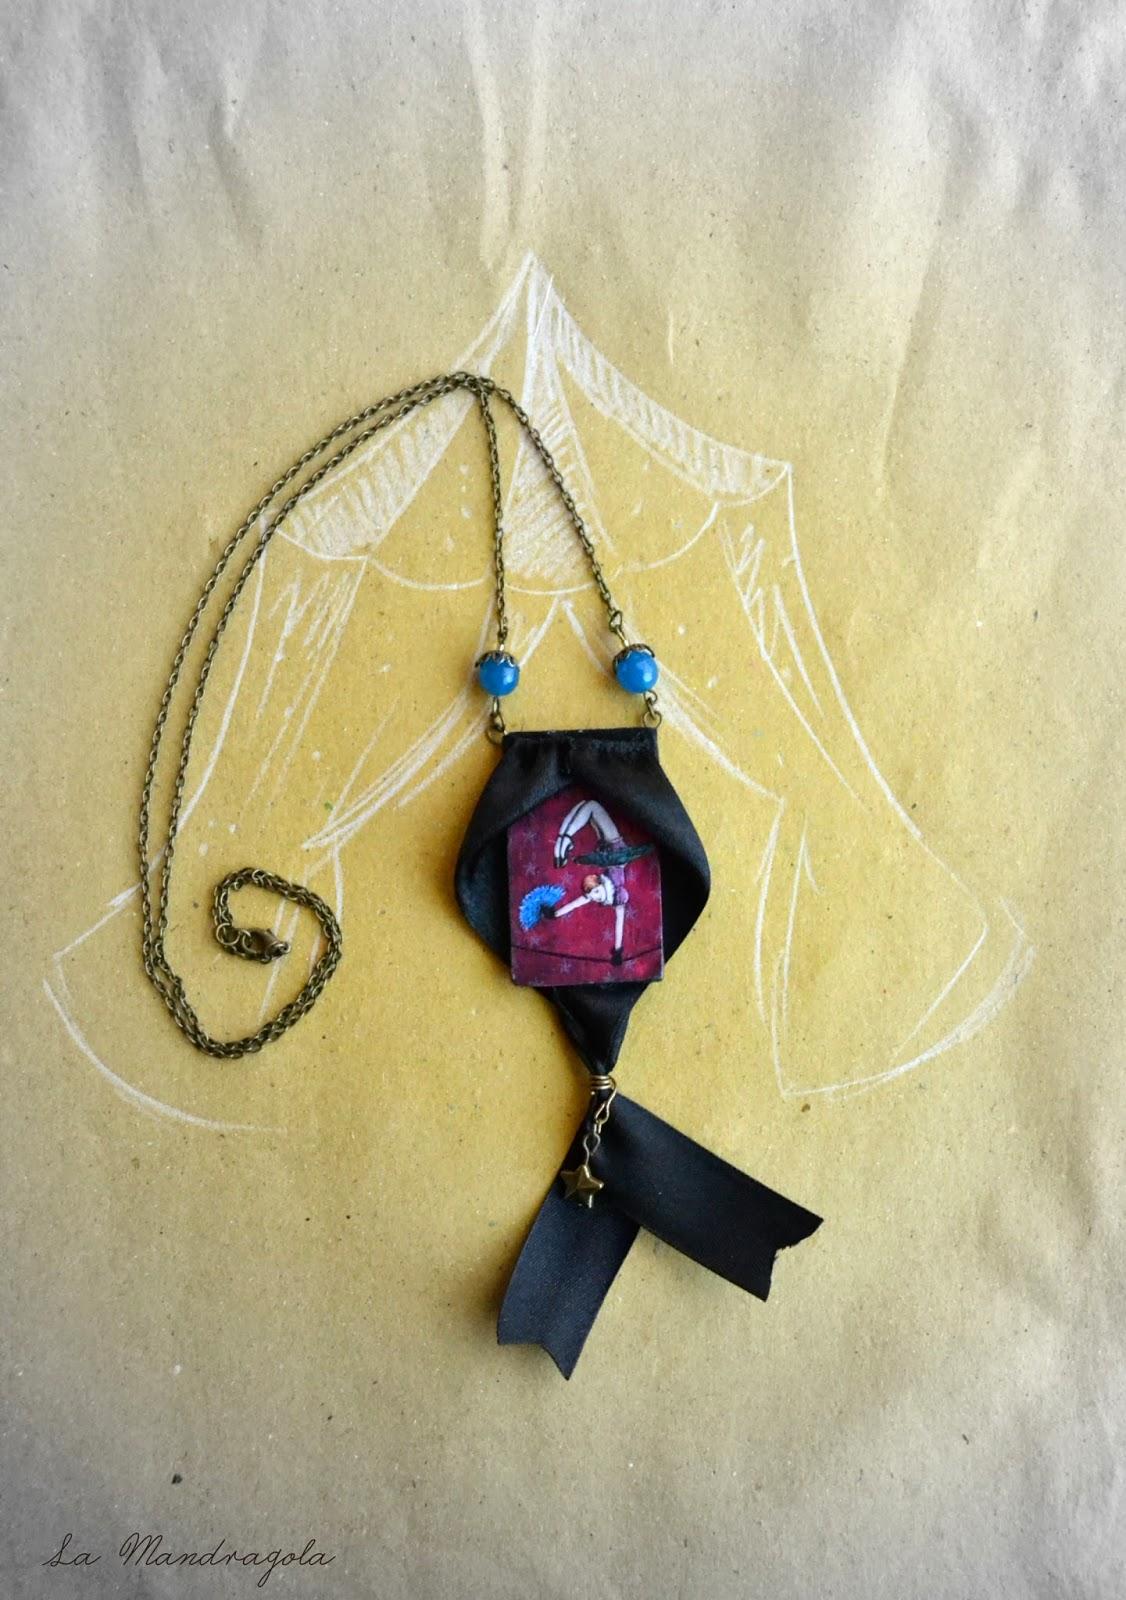 Night Circus - acrobat - freak show - necklace - violet -  la mandragola - Flavia Luglioli - illustration - victorian - etsy - circus - carnival - carousel